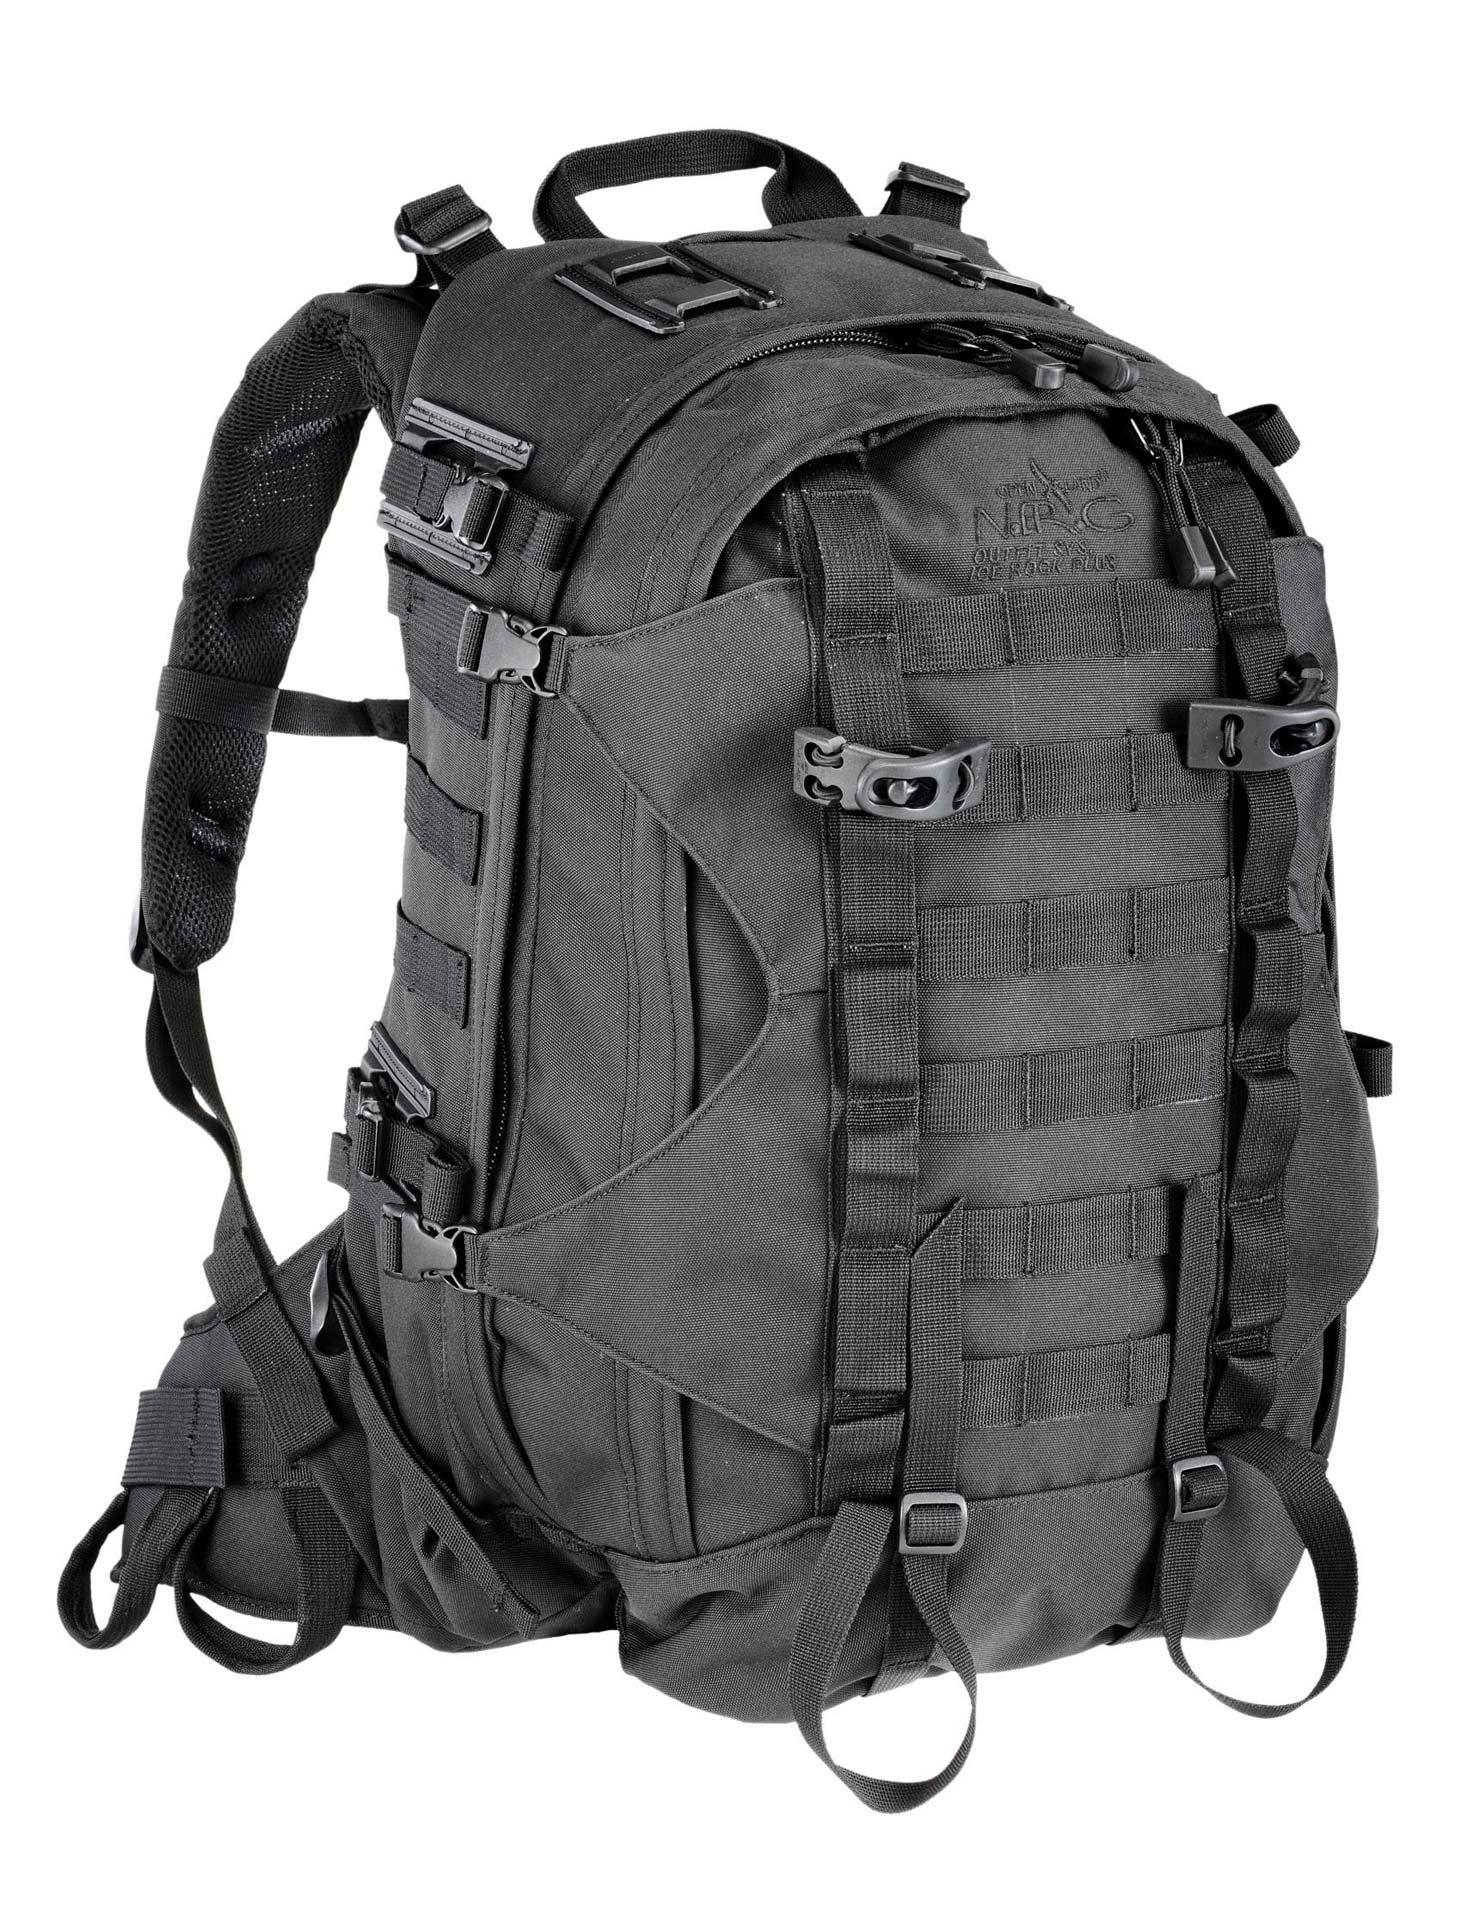 Nerg Ice Rock Plus Back Pack 4045 Lt Nerg Openland